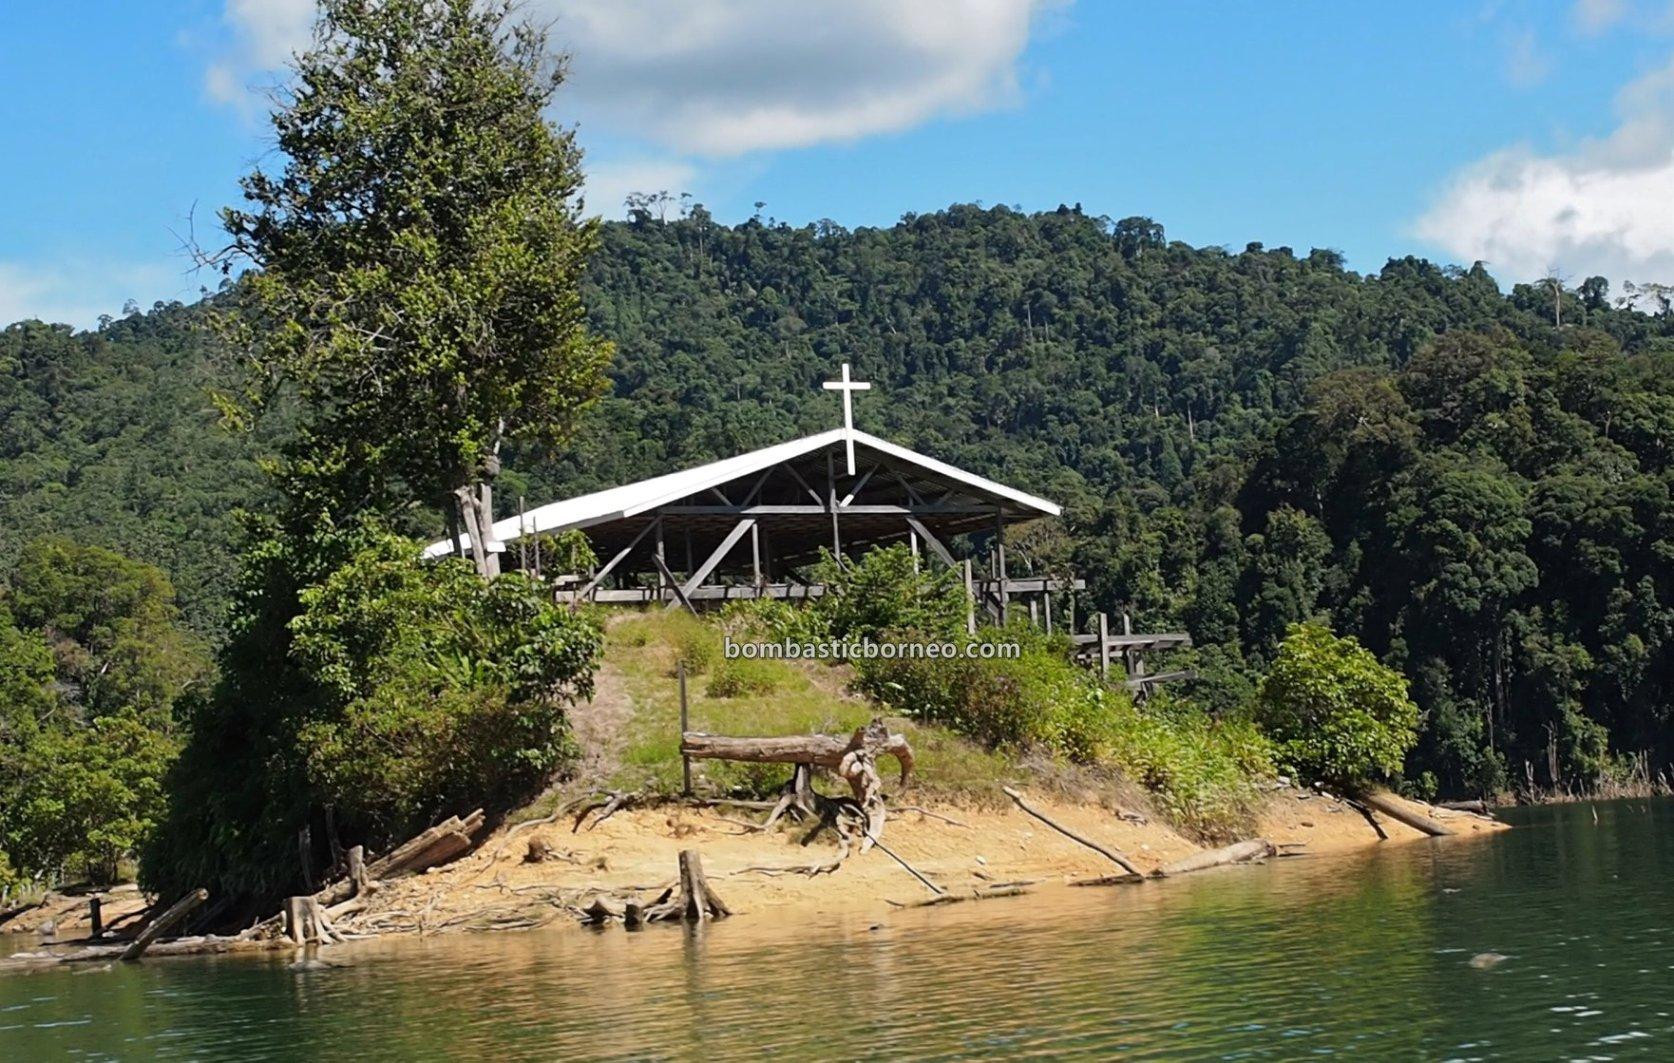 Embankment Dam, empangan, backpackers, destination, Sungai Balui, native, homestay, Belaga, Kapit, Malaysia, Tourism, travel guide, Borneo, 砂拉越峇贡水坝, 巫拉甲马来西亚,